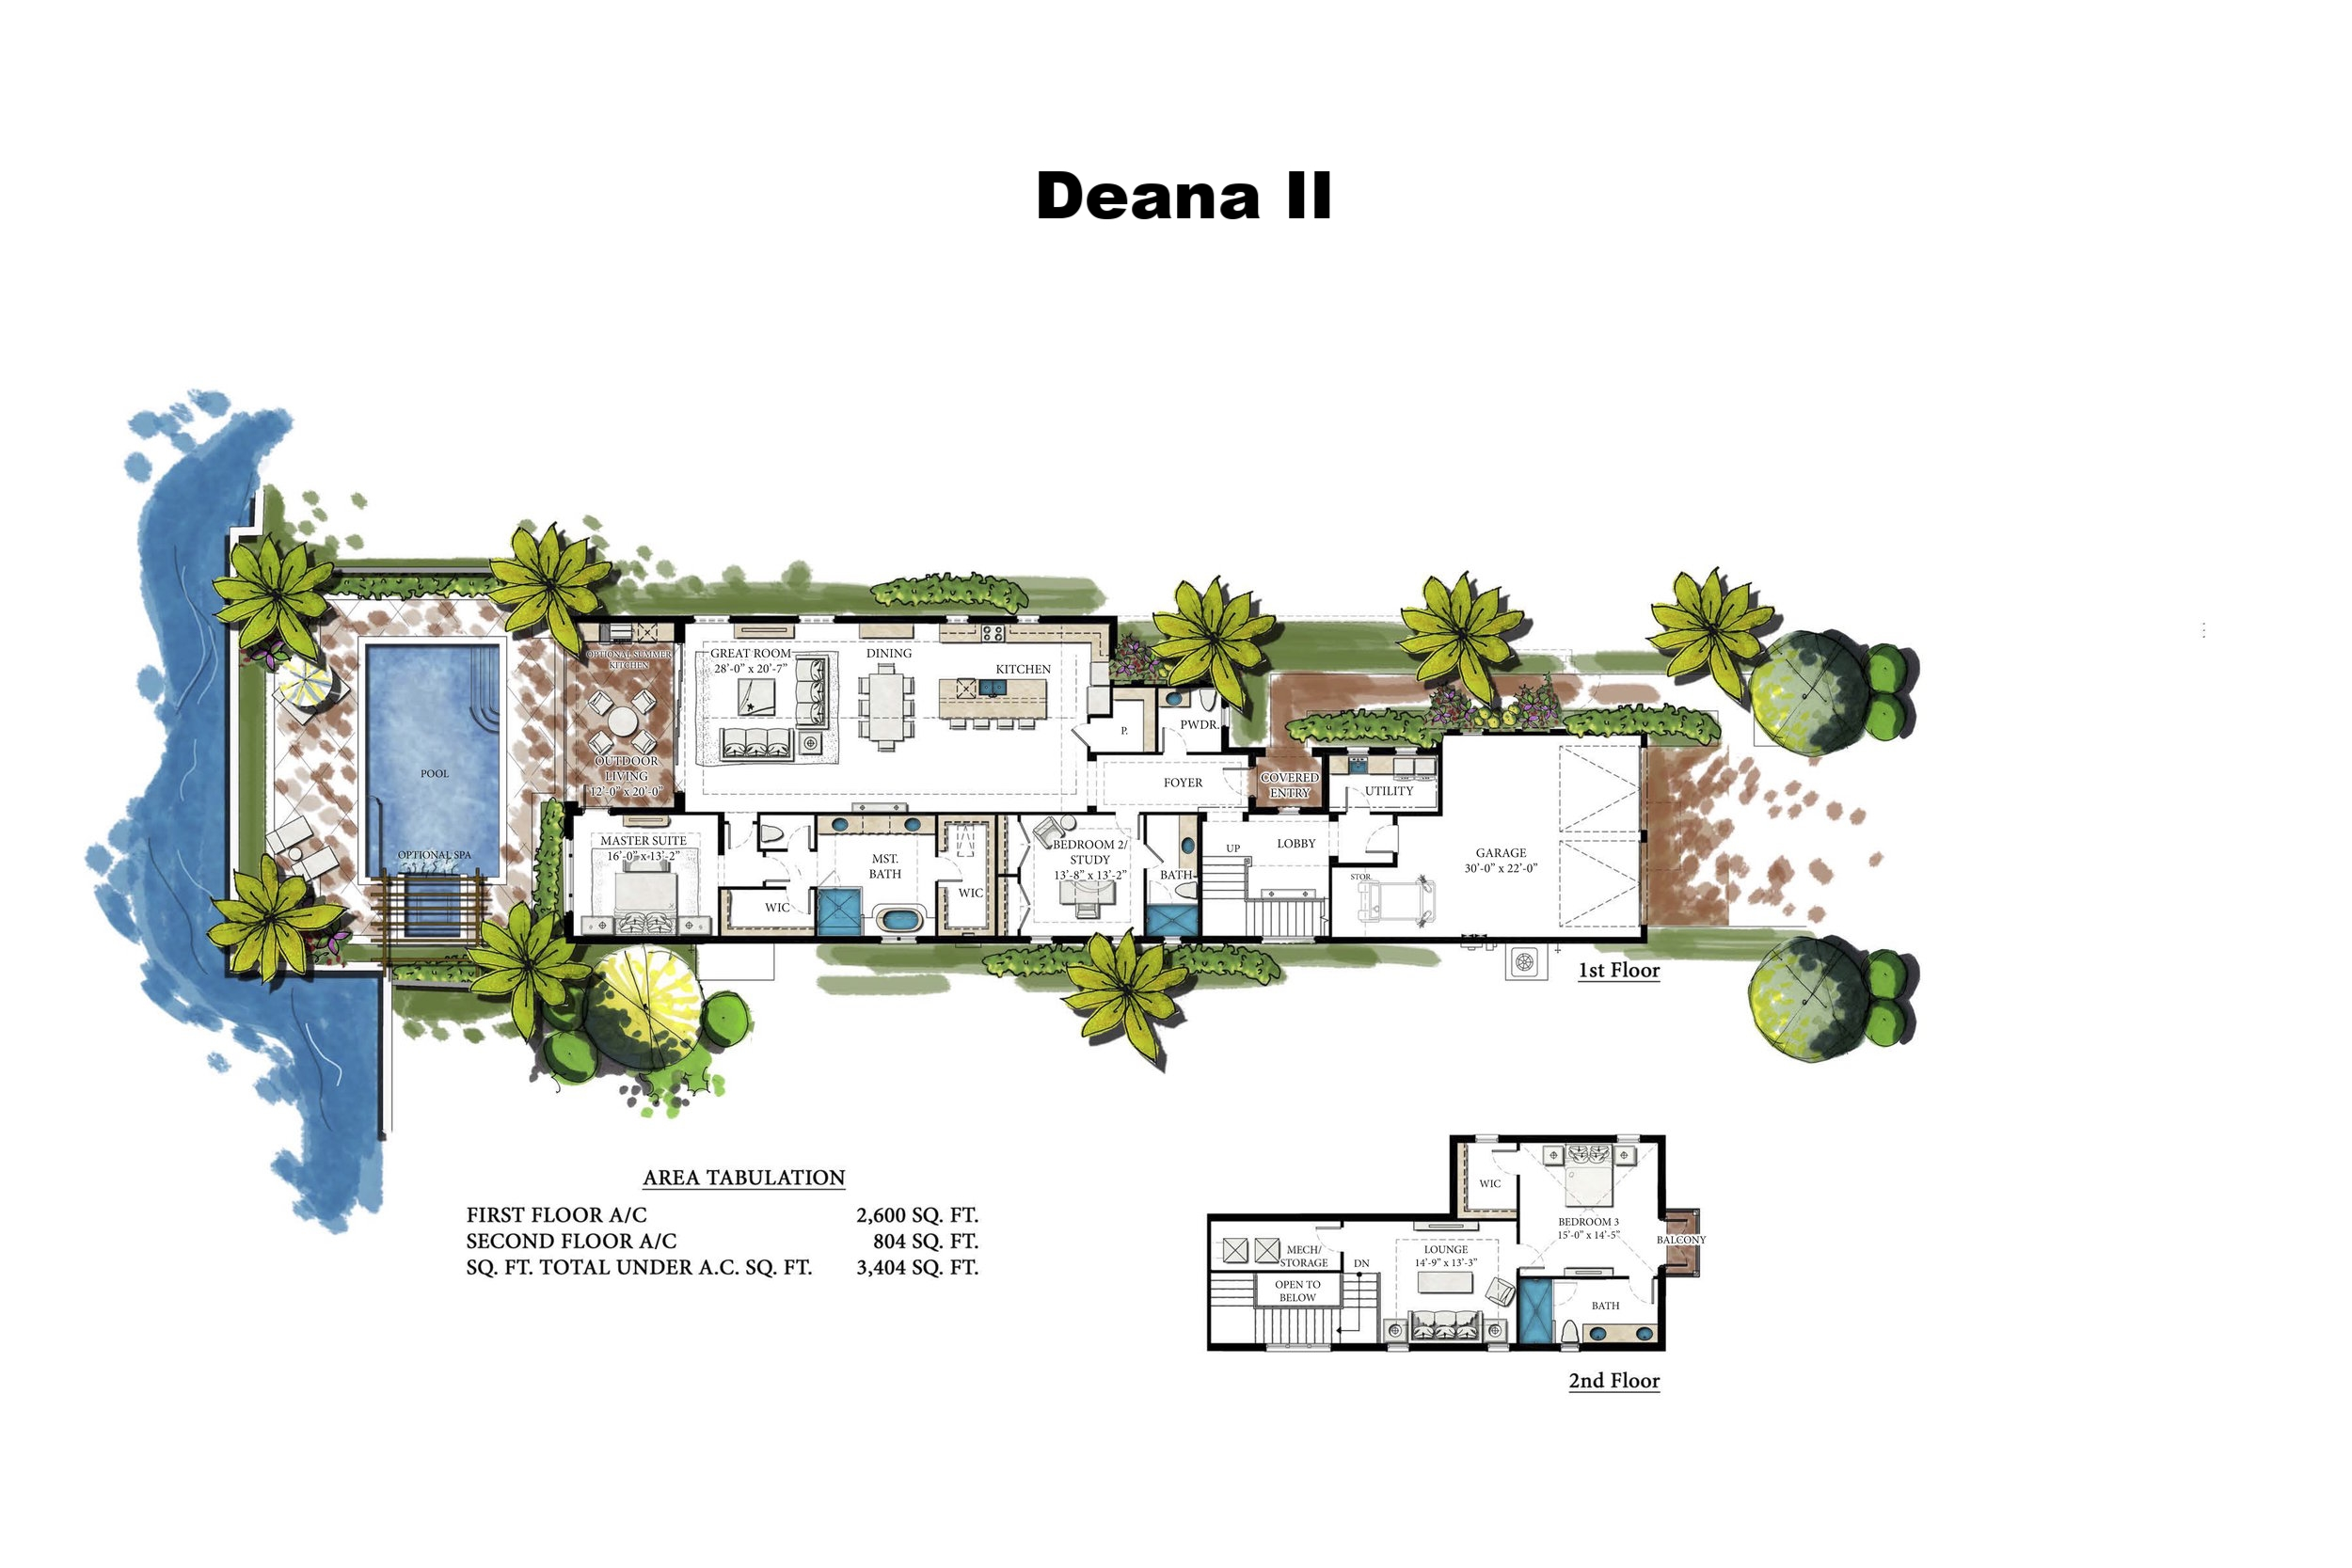 Watercourse Deana 2 FLOOR PLAN RENDERING 5-23-17.jpg